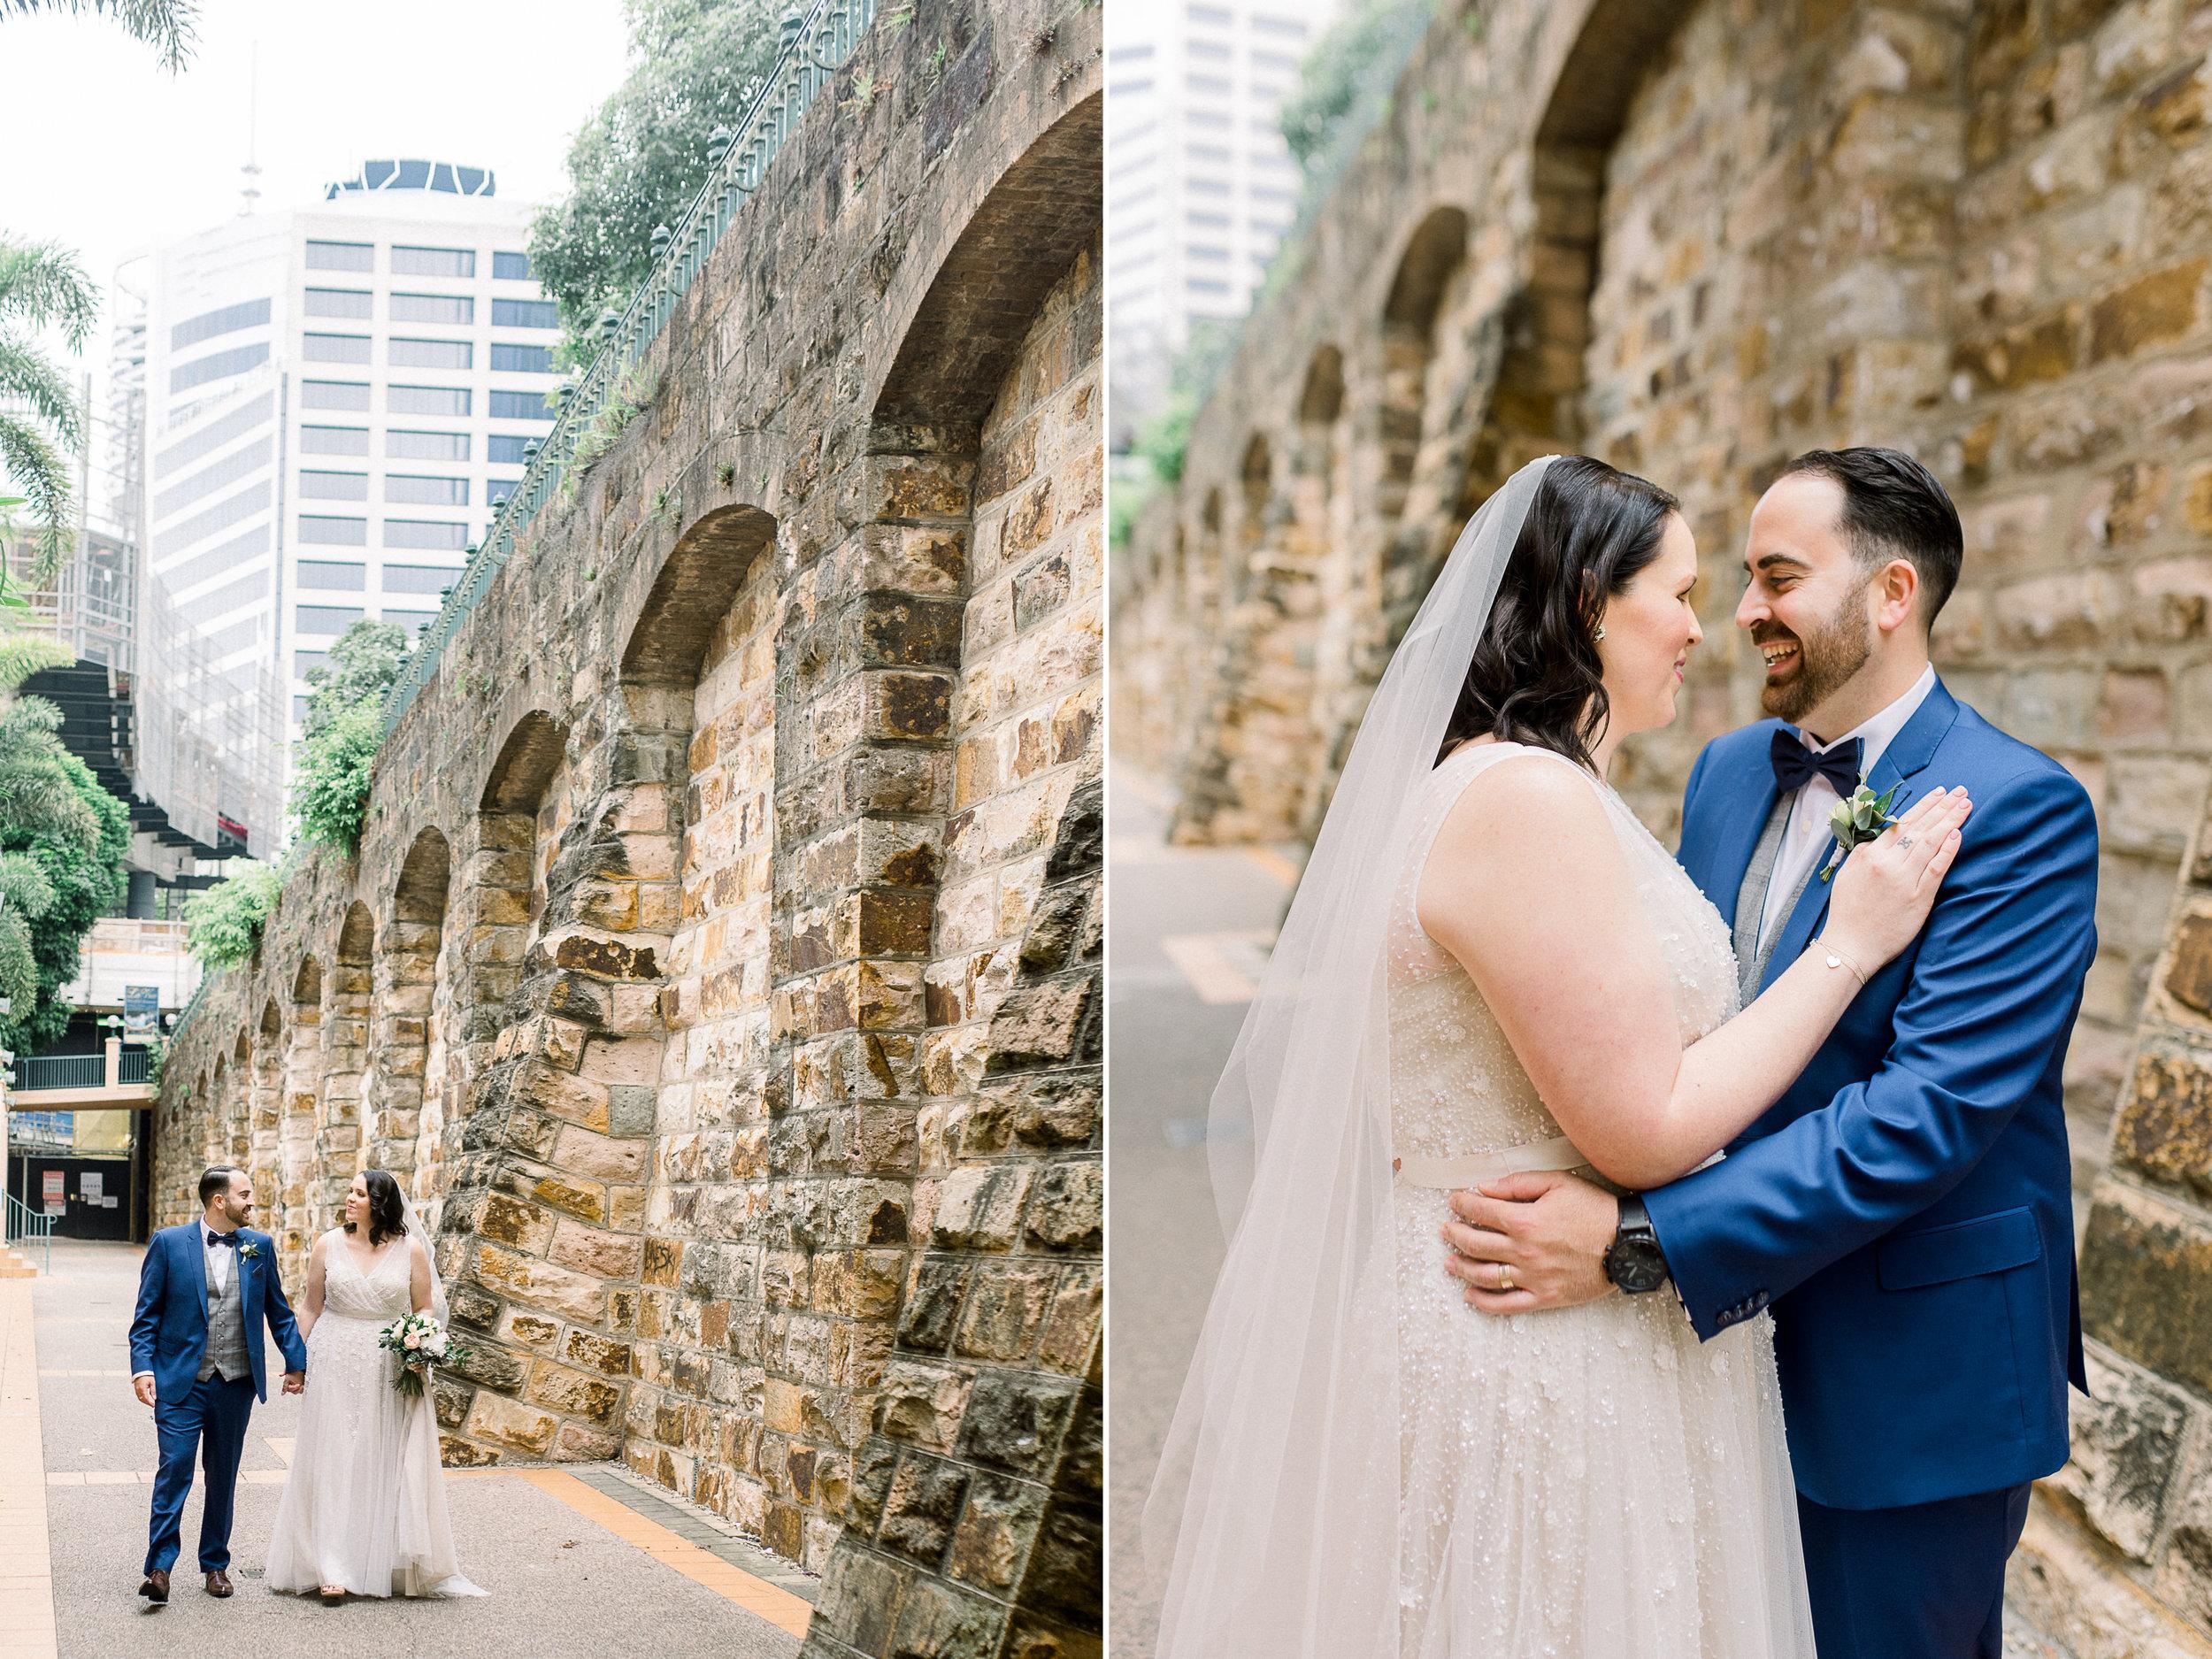 brisbane-city-wedding-romantic-bridal-photos-3.jpg